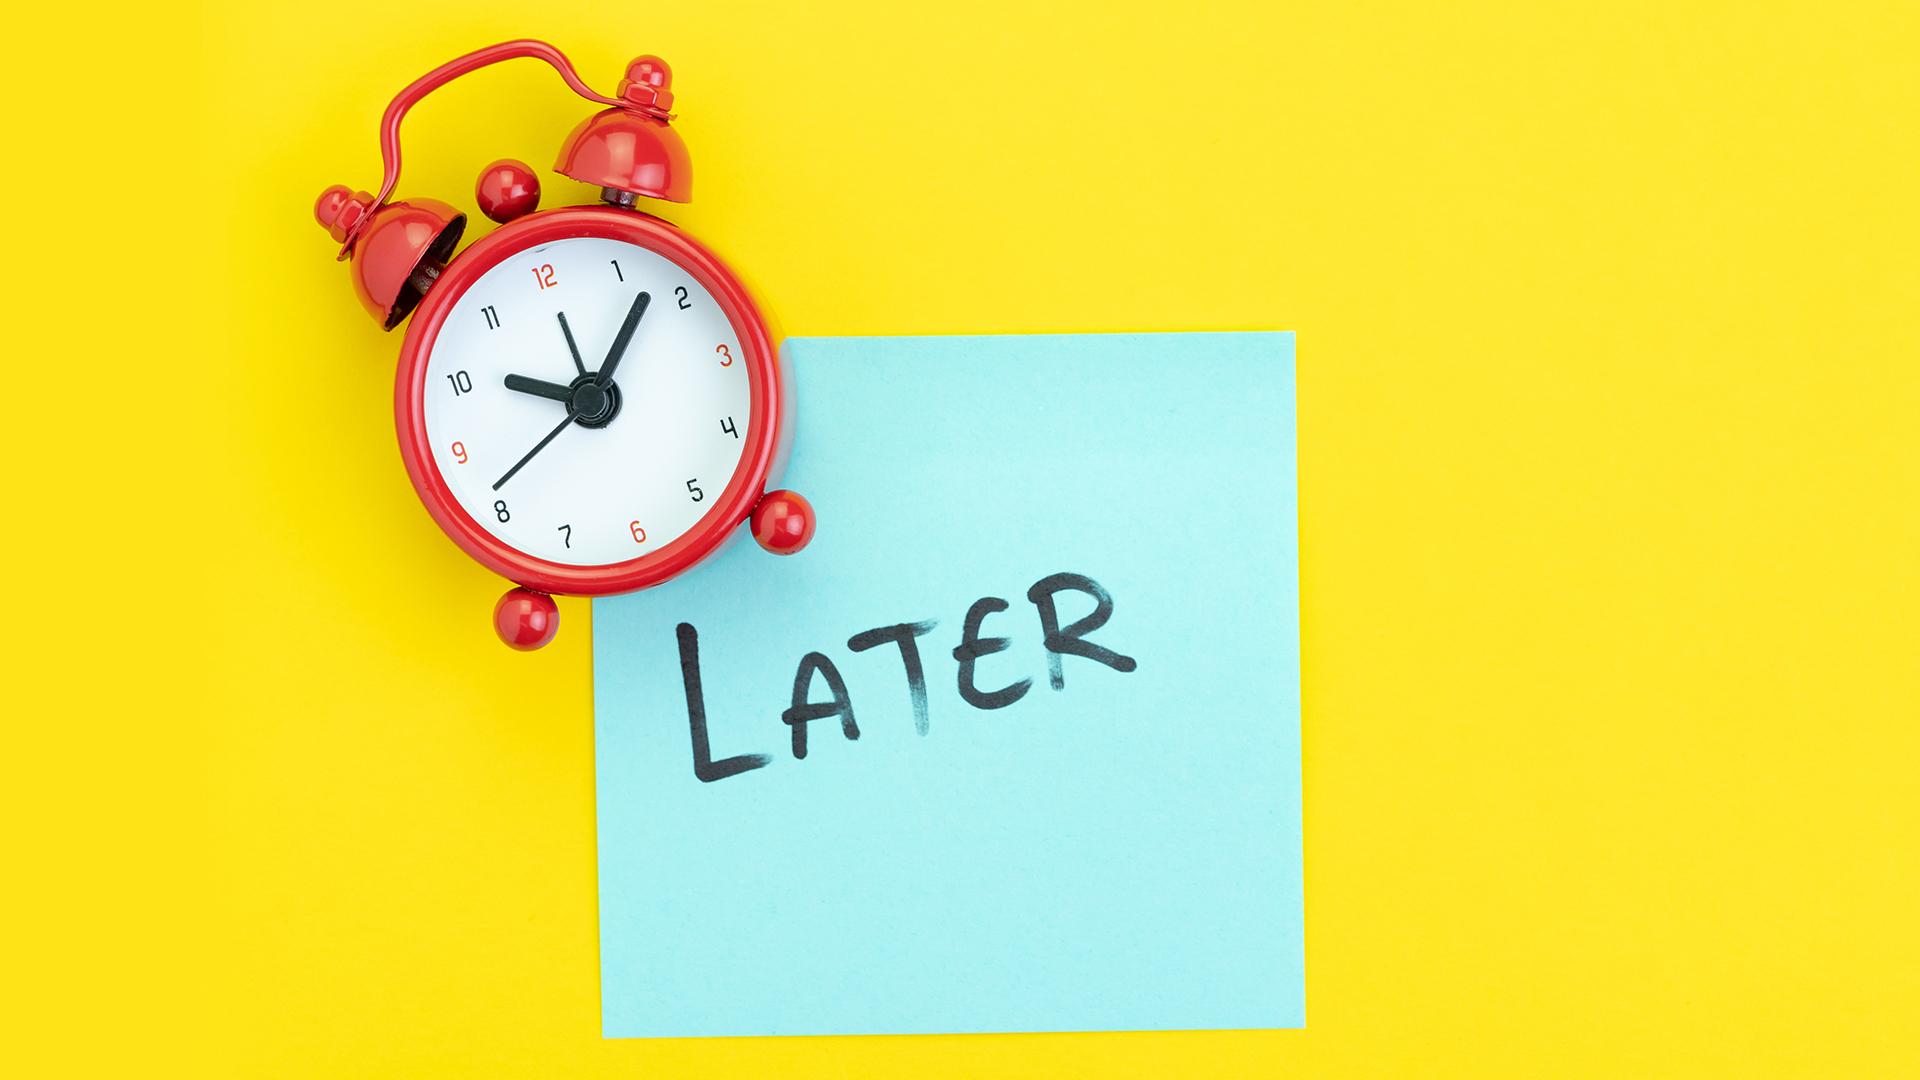 WellbeingHub procrastination